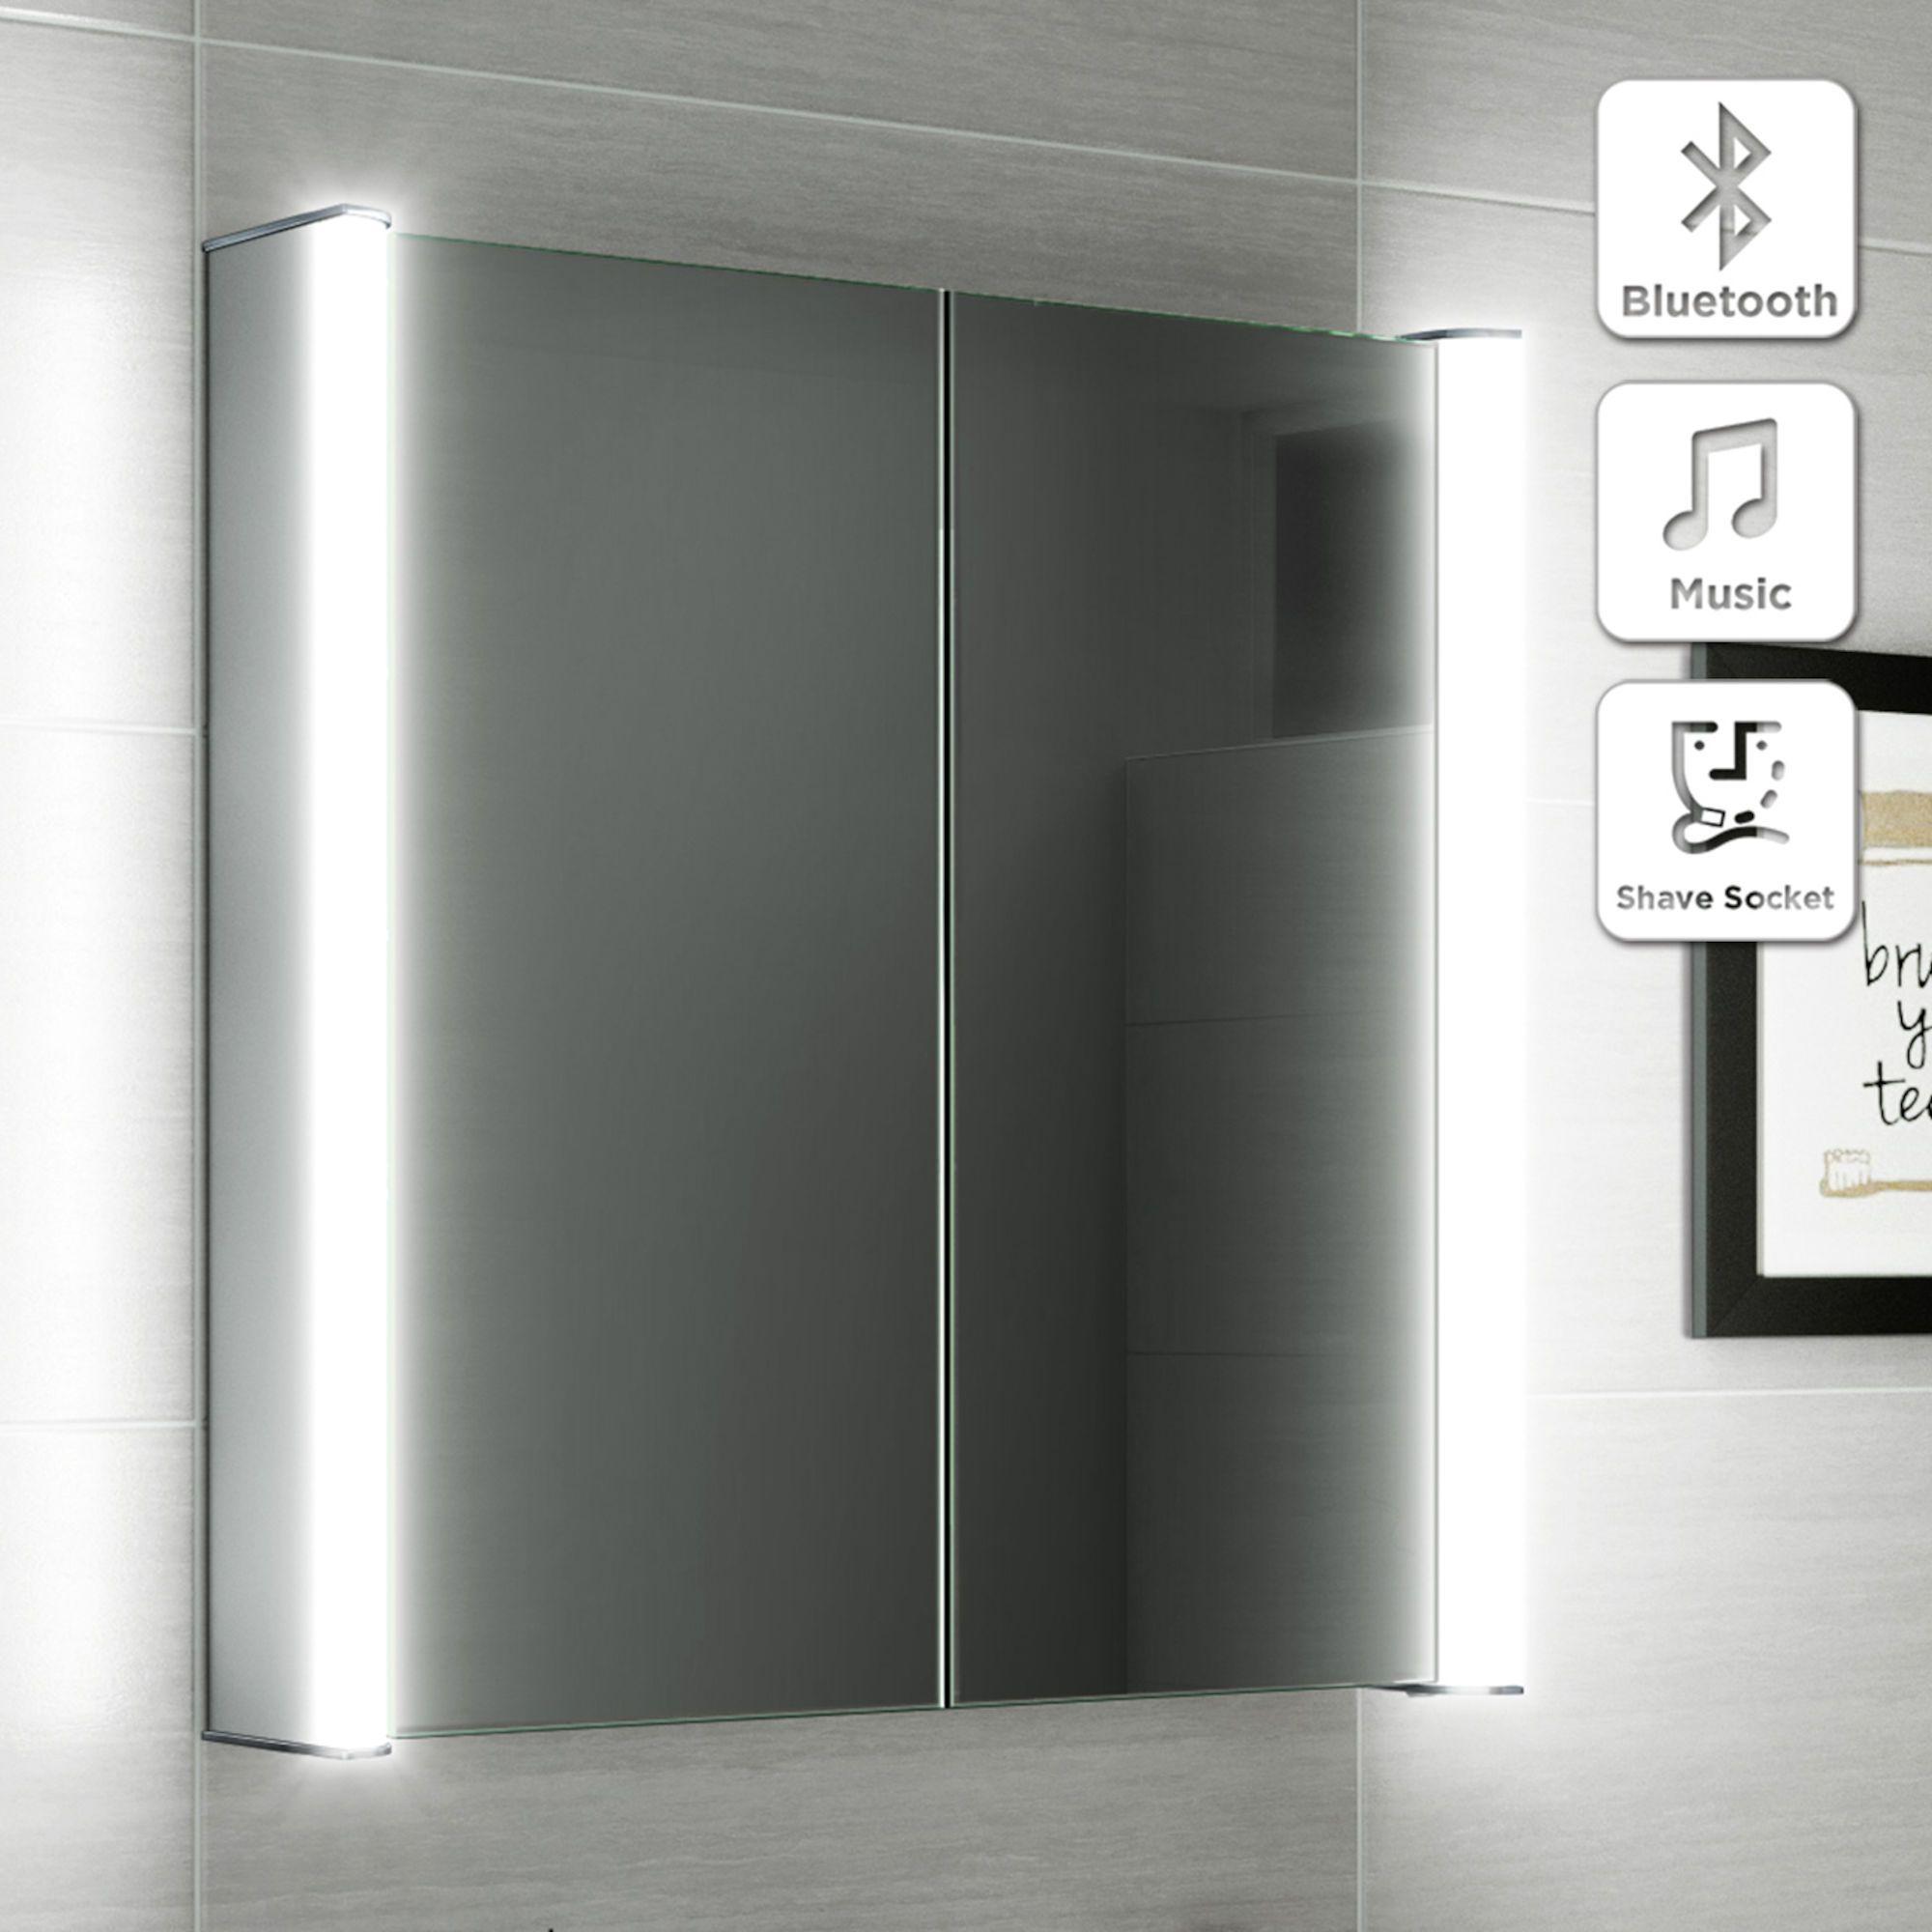 600x650mm Luminaire Illuminated Led Mirror Cabinet Bluetooth Speaker Shaver Socket Led Mirror Bathroom Mirror Cabinets Bathroom Mirror Cabinet